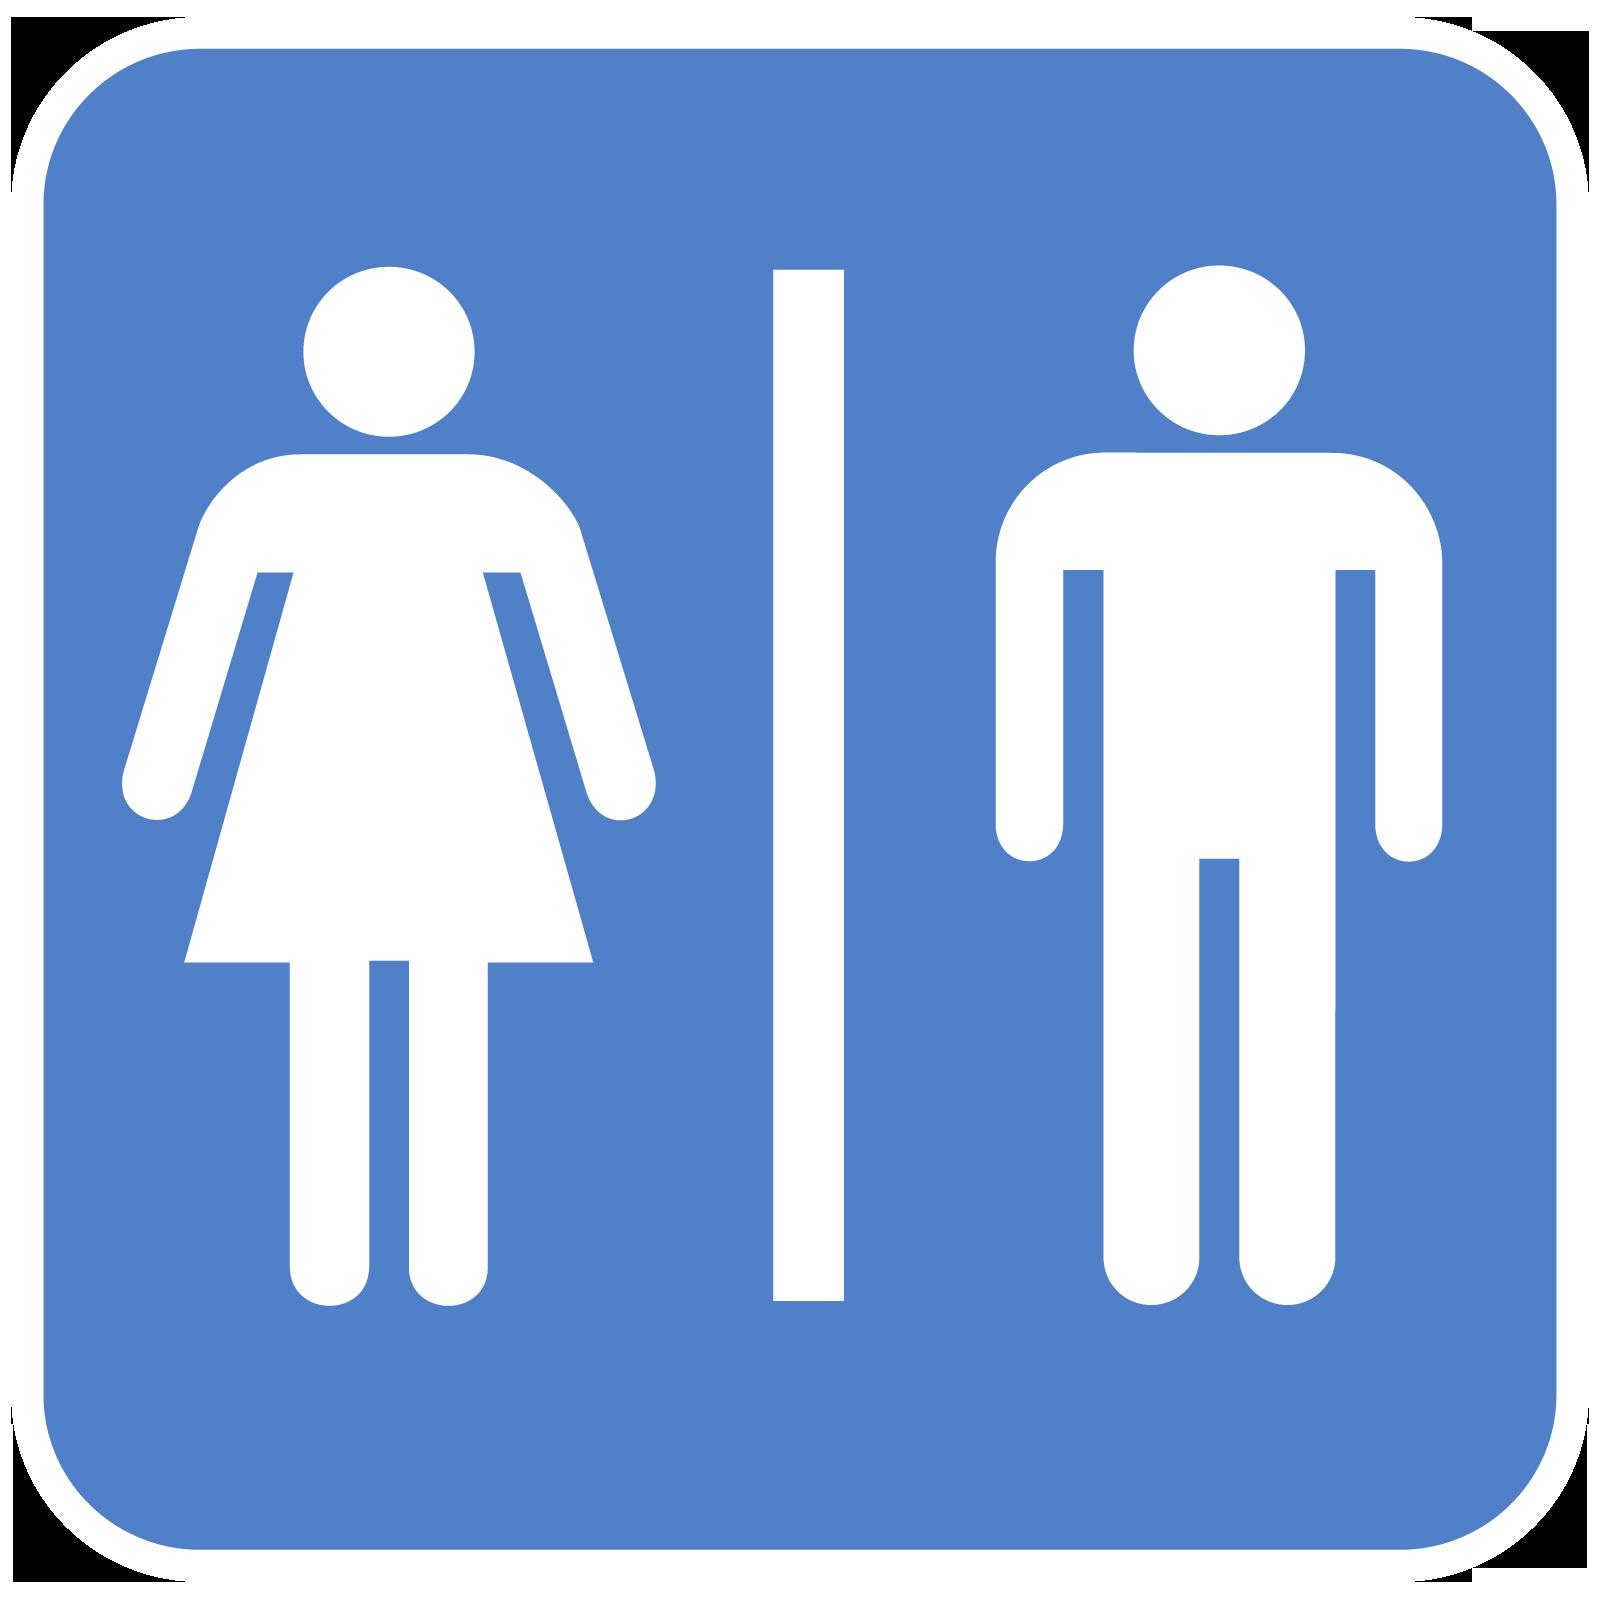 Oxford repeals anti-transgender bathroom ordinance